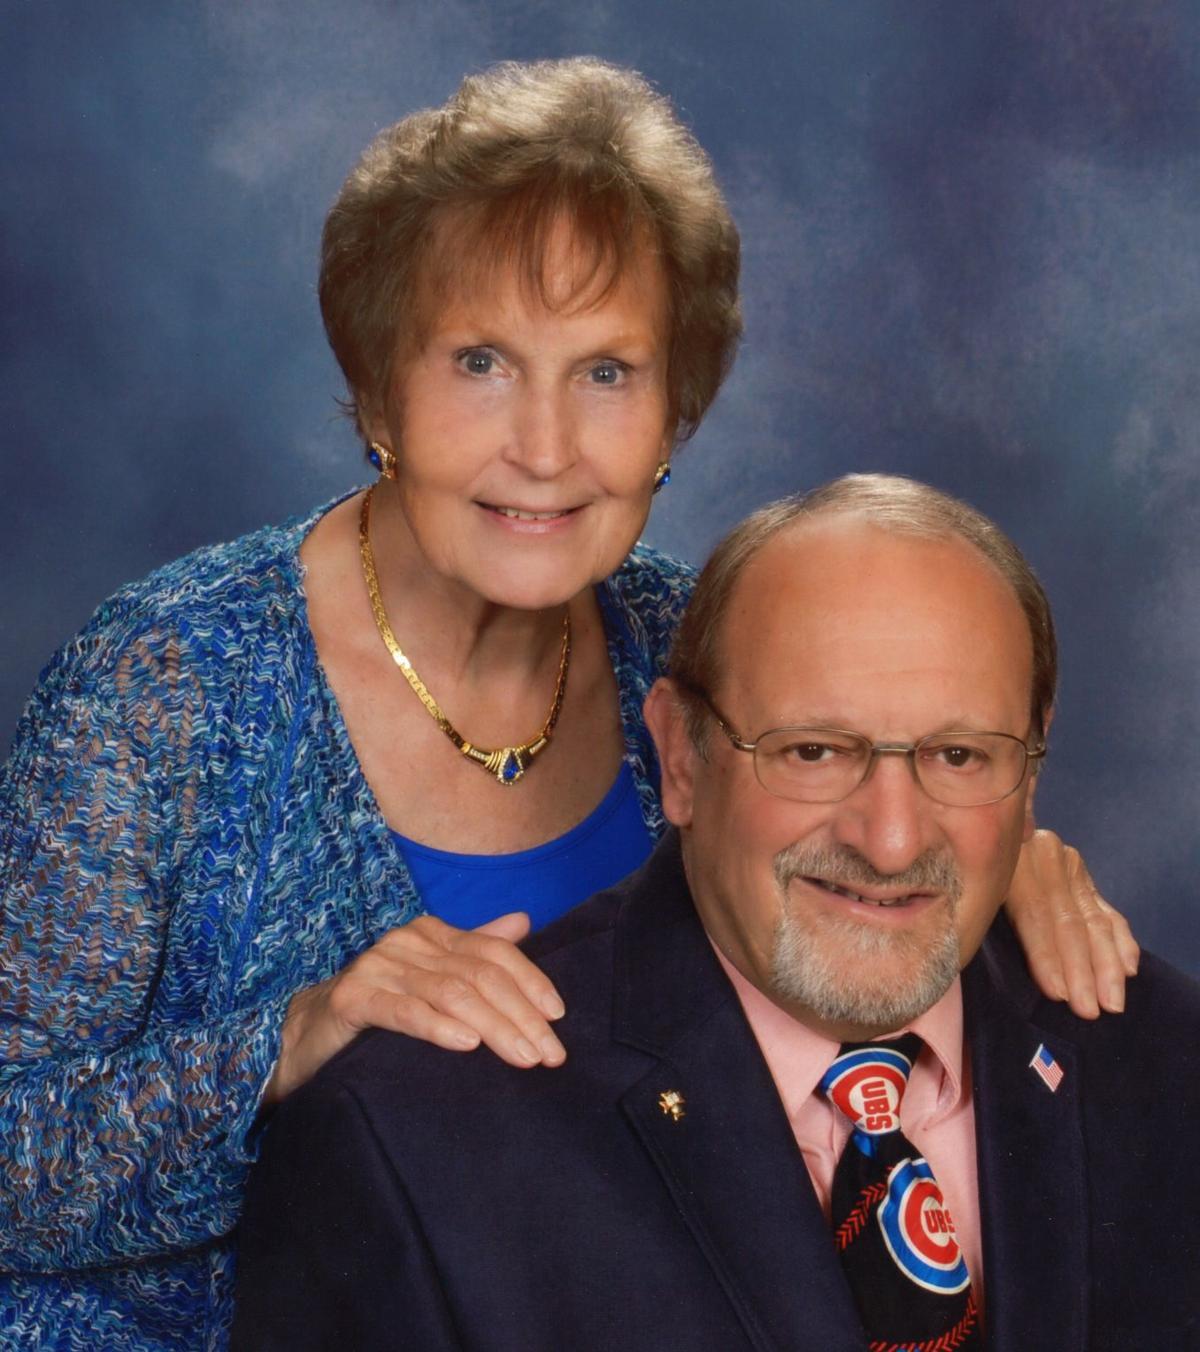 Mr. and Mrs. Steve Jansta